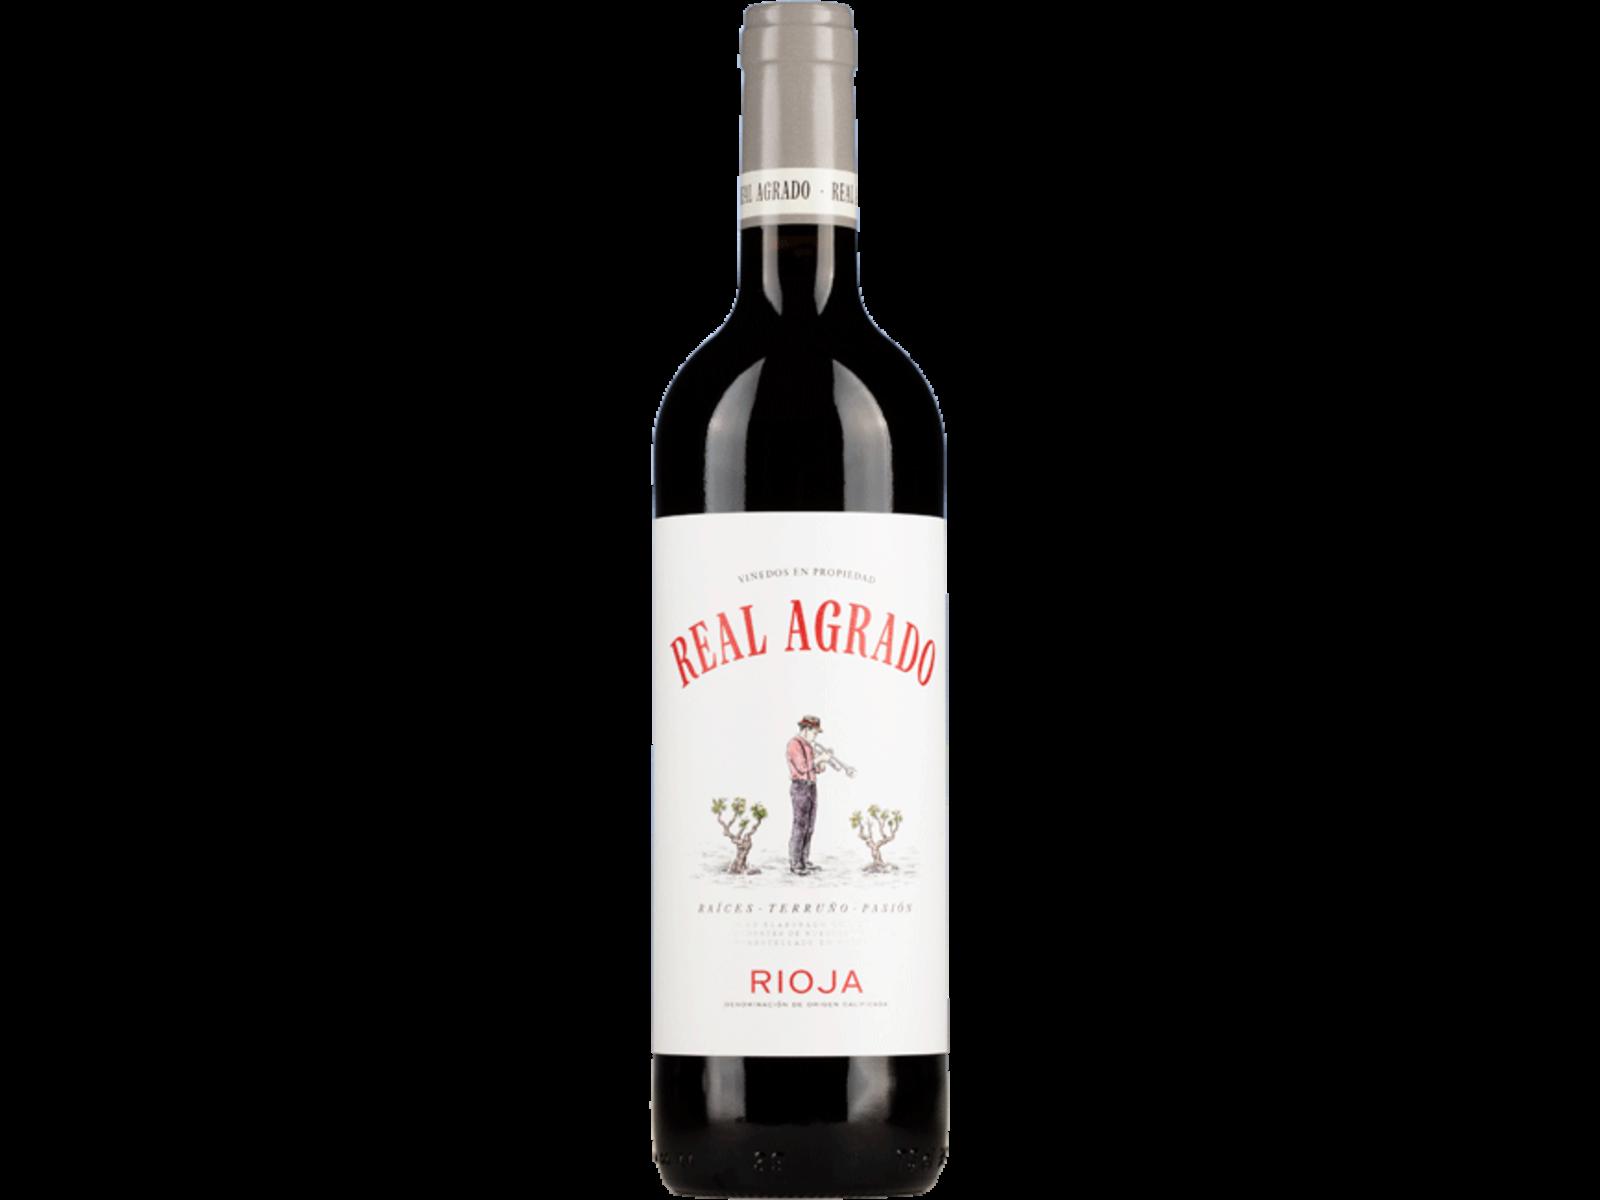 Real Agrado/Viñedos Alfaro Real Agrado / Rioja Tinto